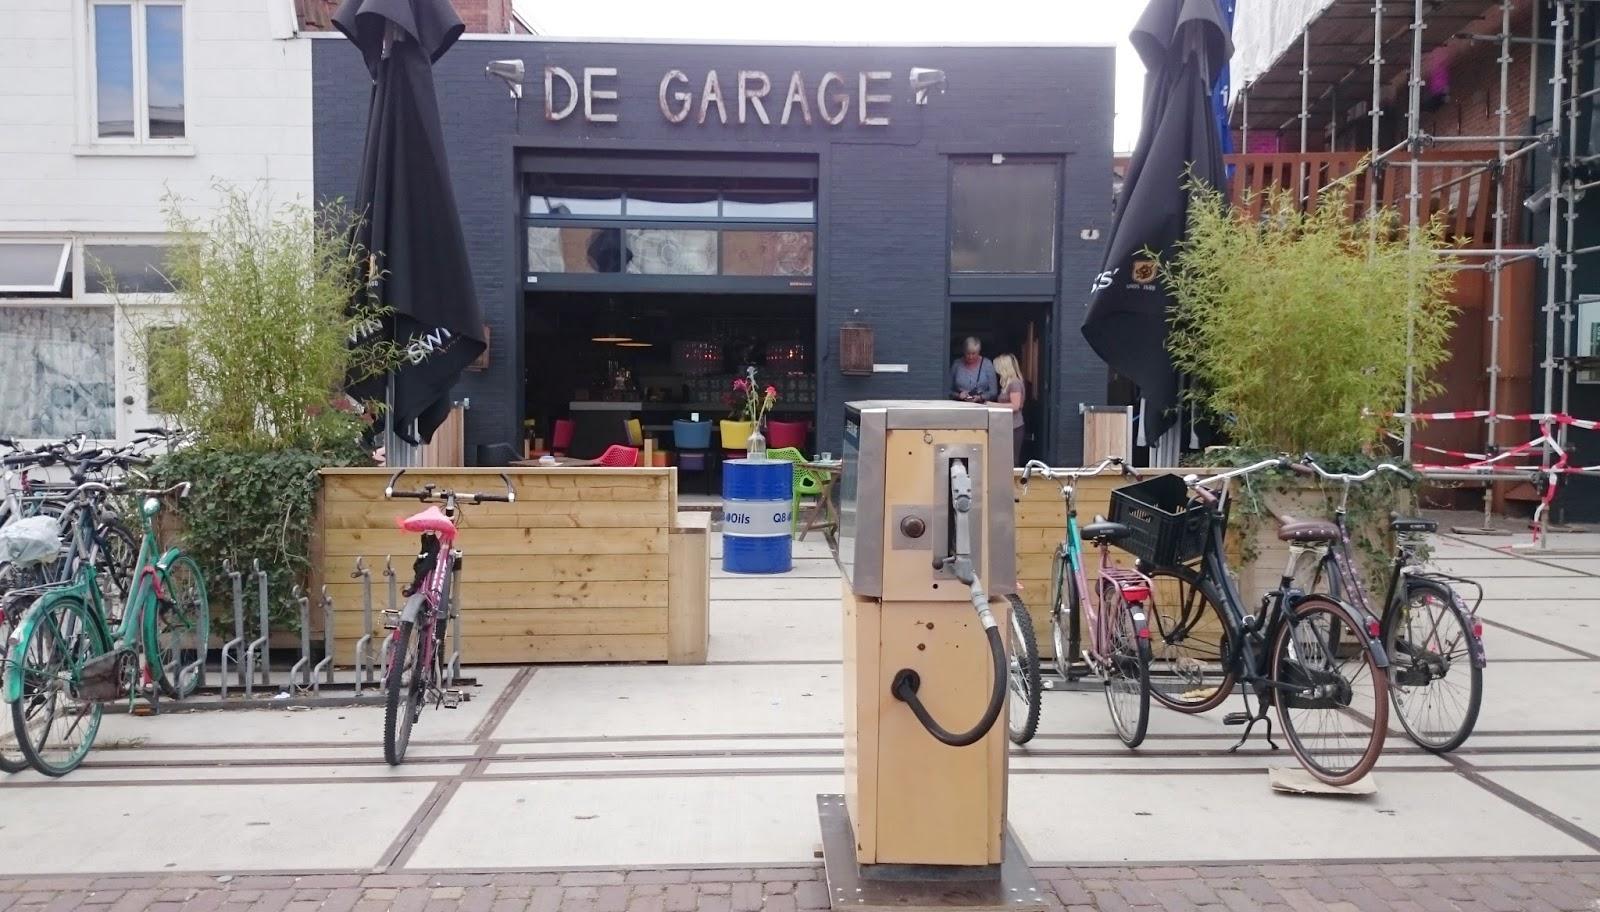 Garage Huren Groningen : Rosa fashion sports hotspot groningen de garage